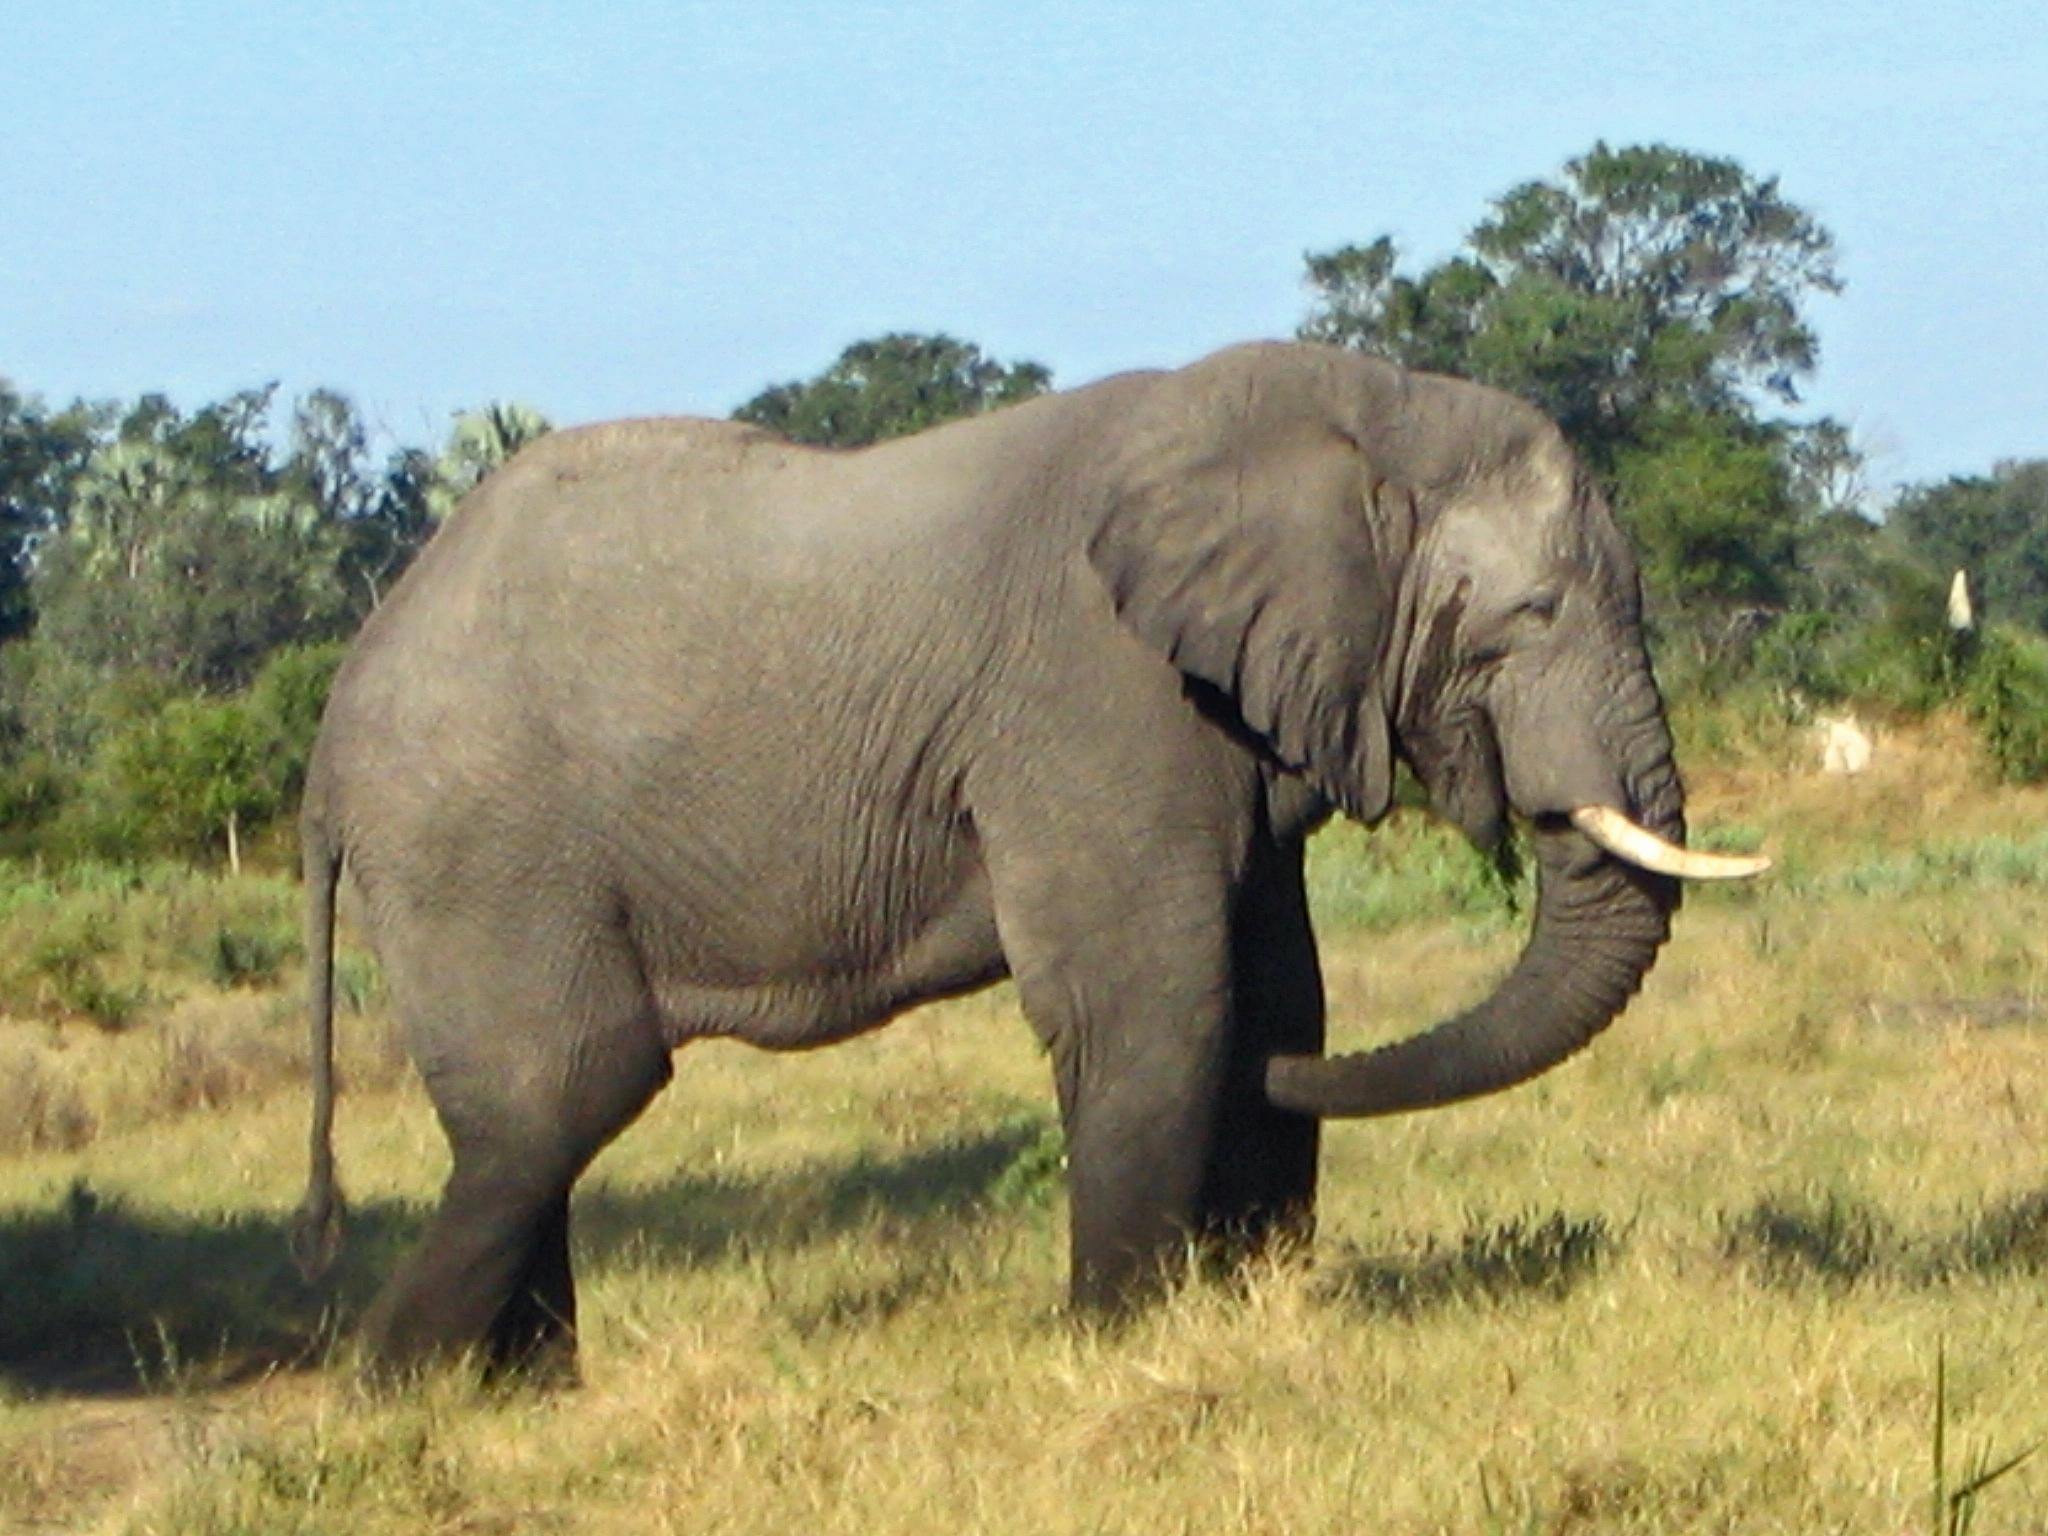 Gajah Afrika Wikipedia Bahasa Indonesia Ensiklopedia Bebas